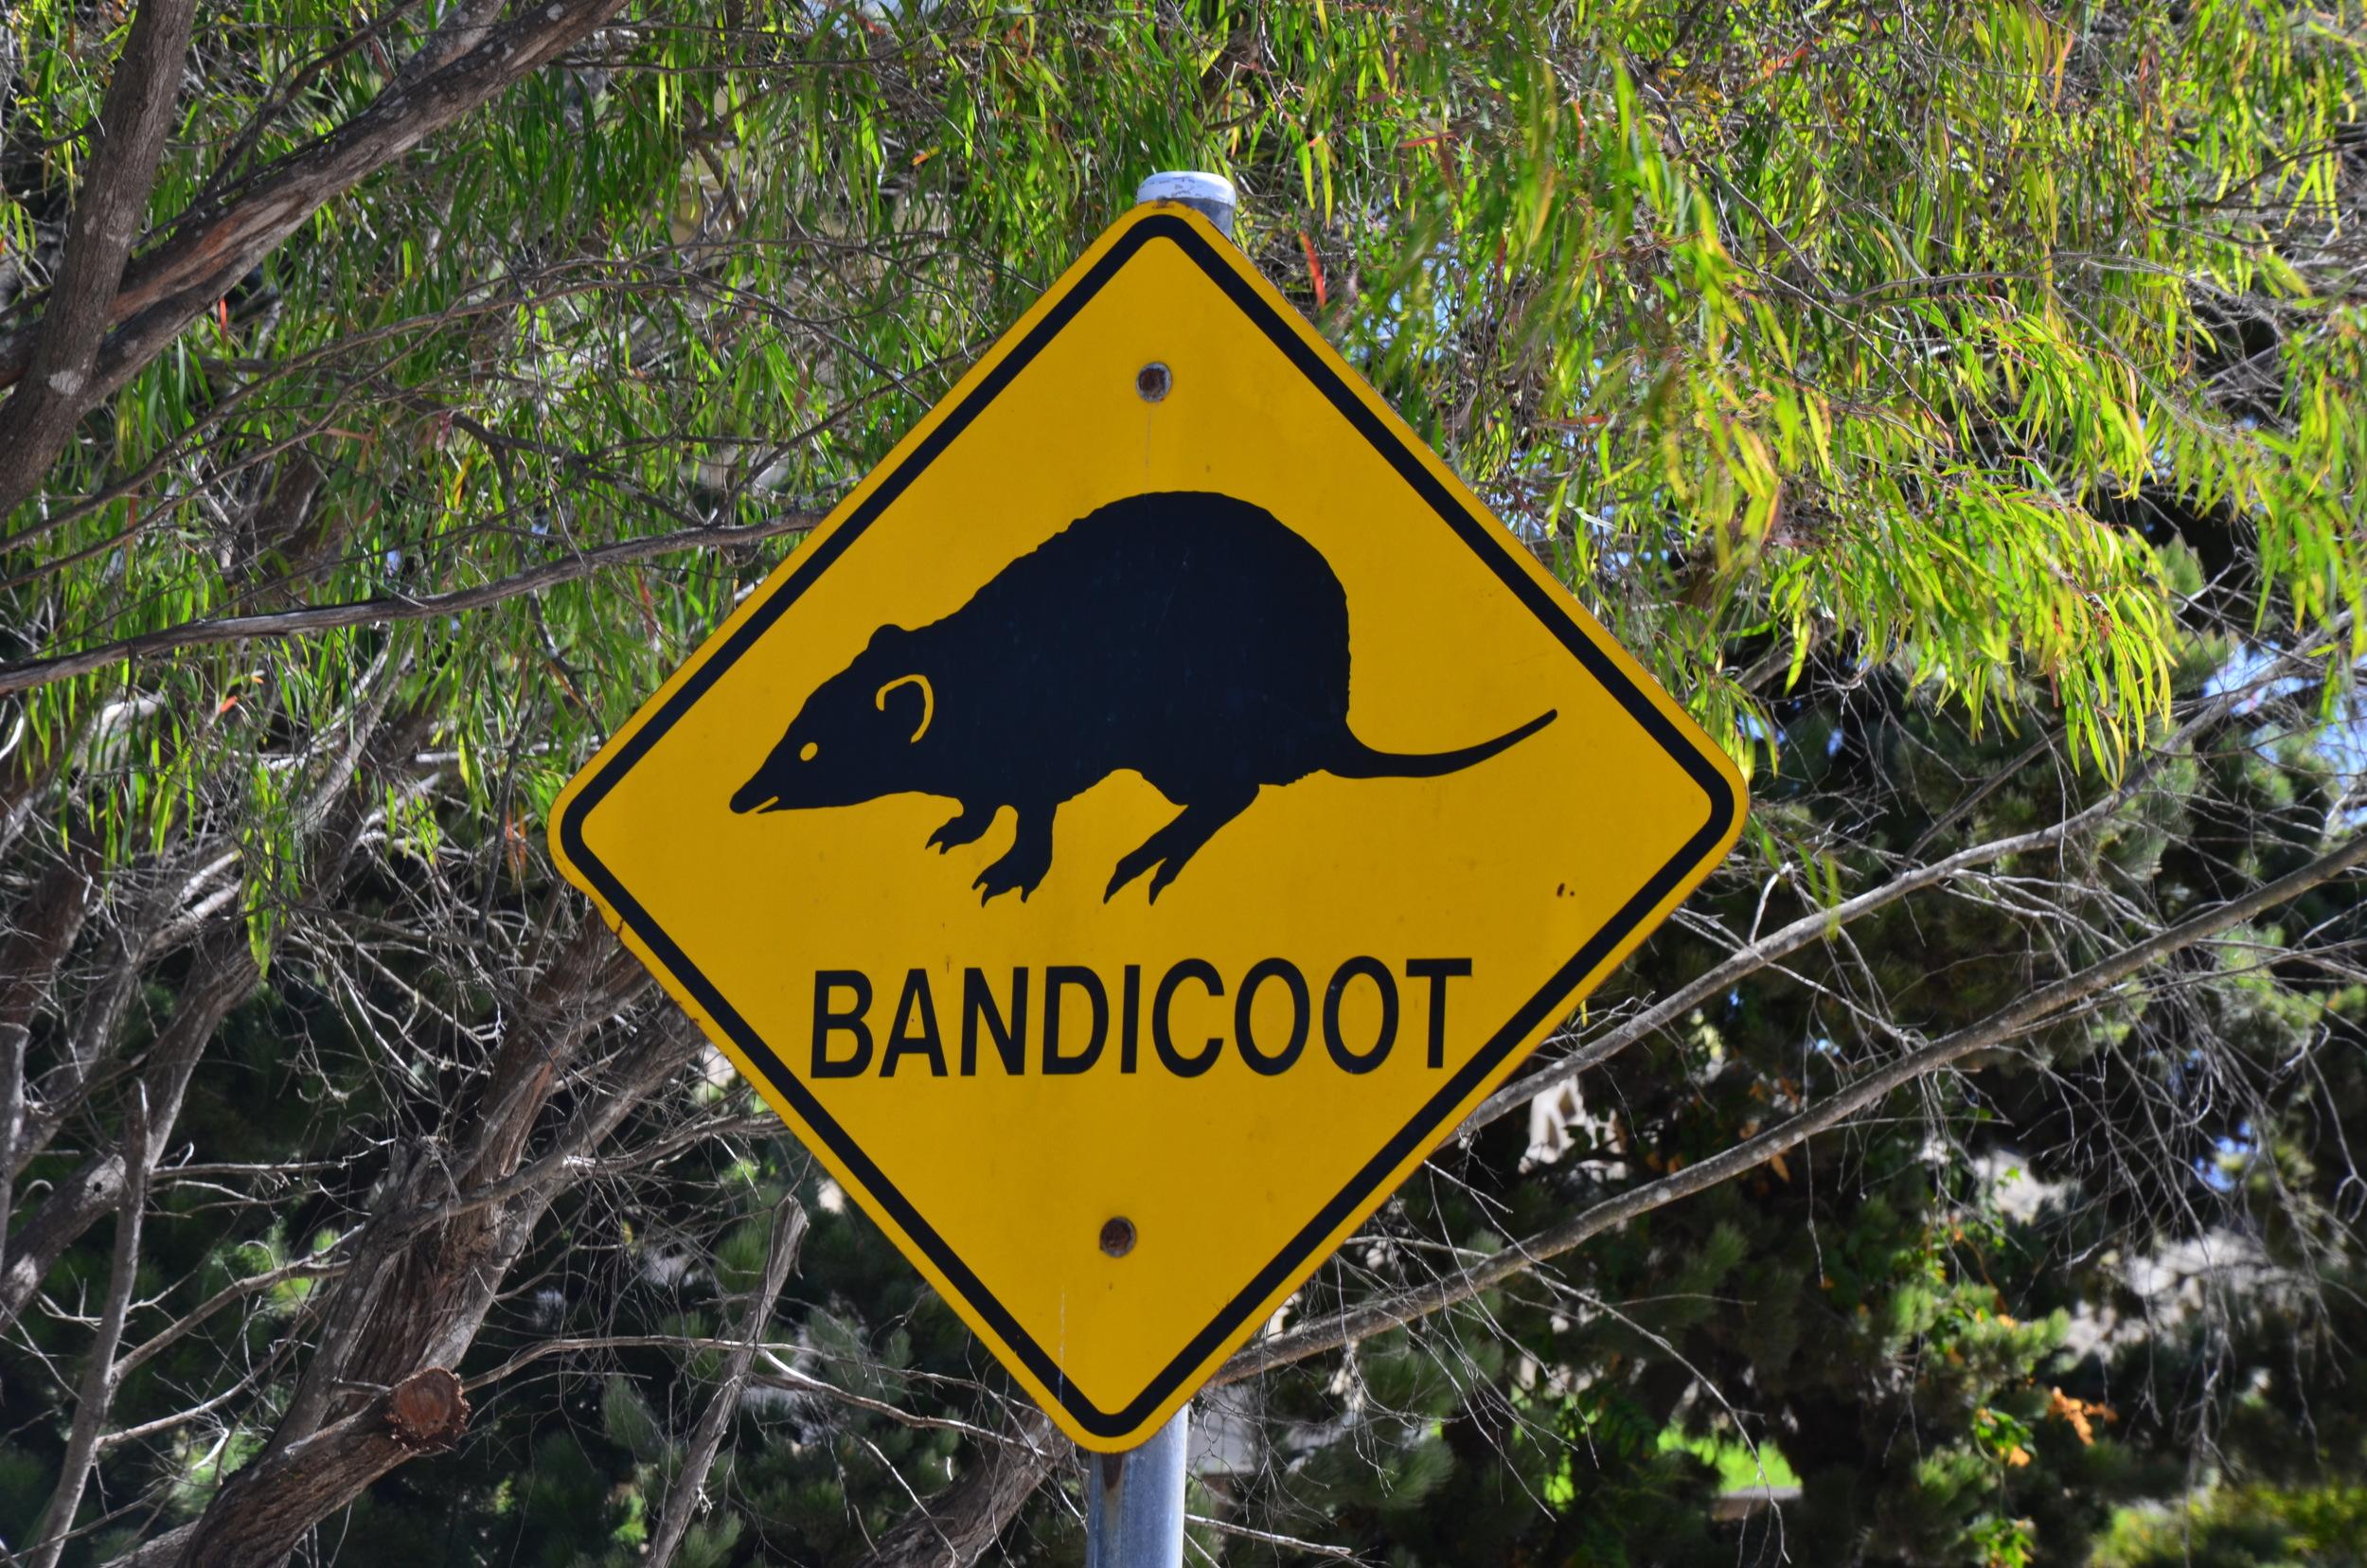 Bandicoot, Kev thinks it's a fancy Australian name for rat, crossing.